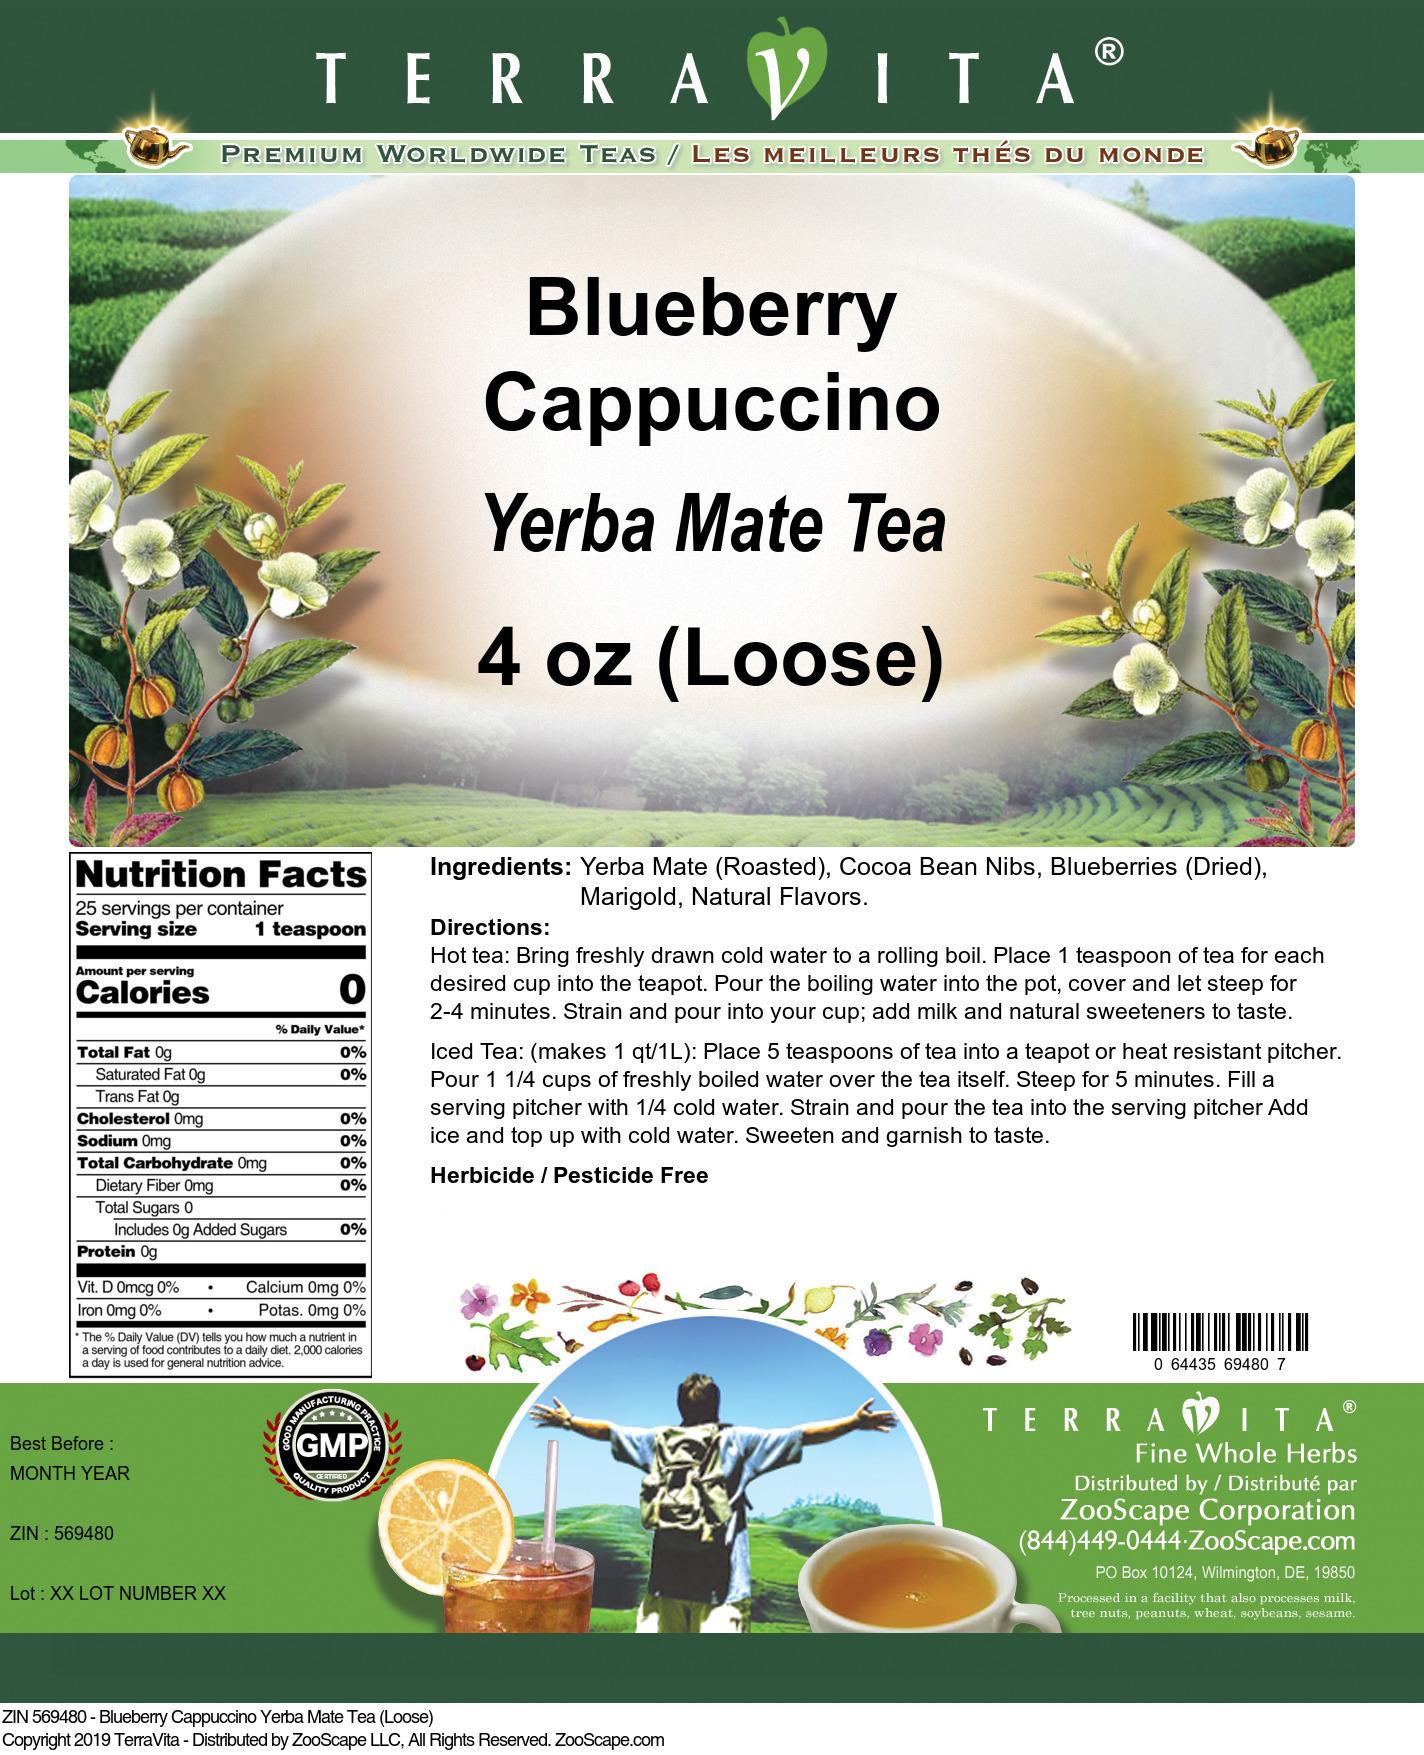 Blueberry Cappuccino Yerba Mate Tea (Loose)